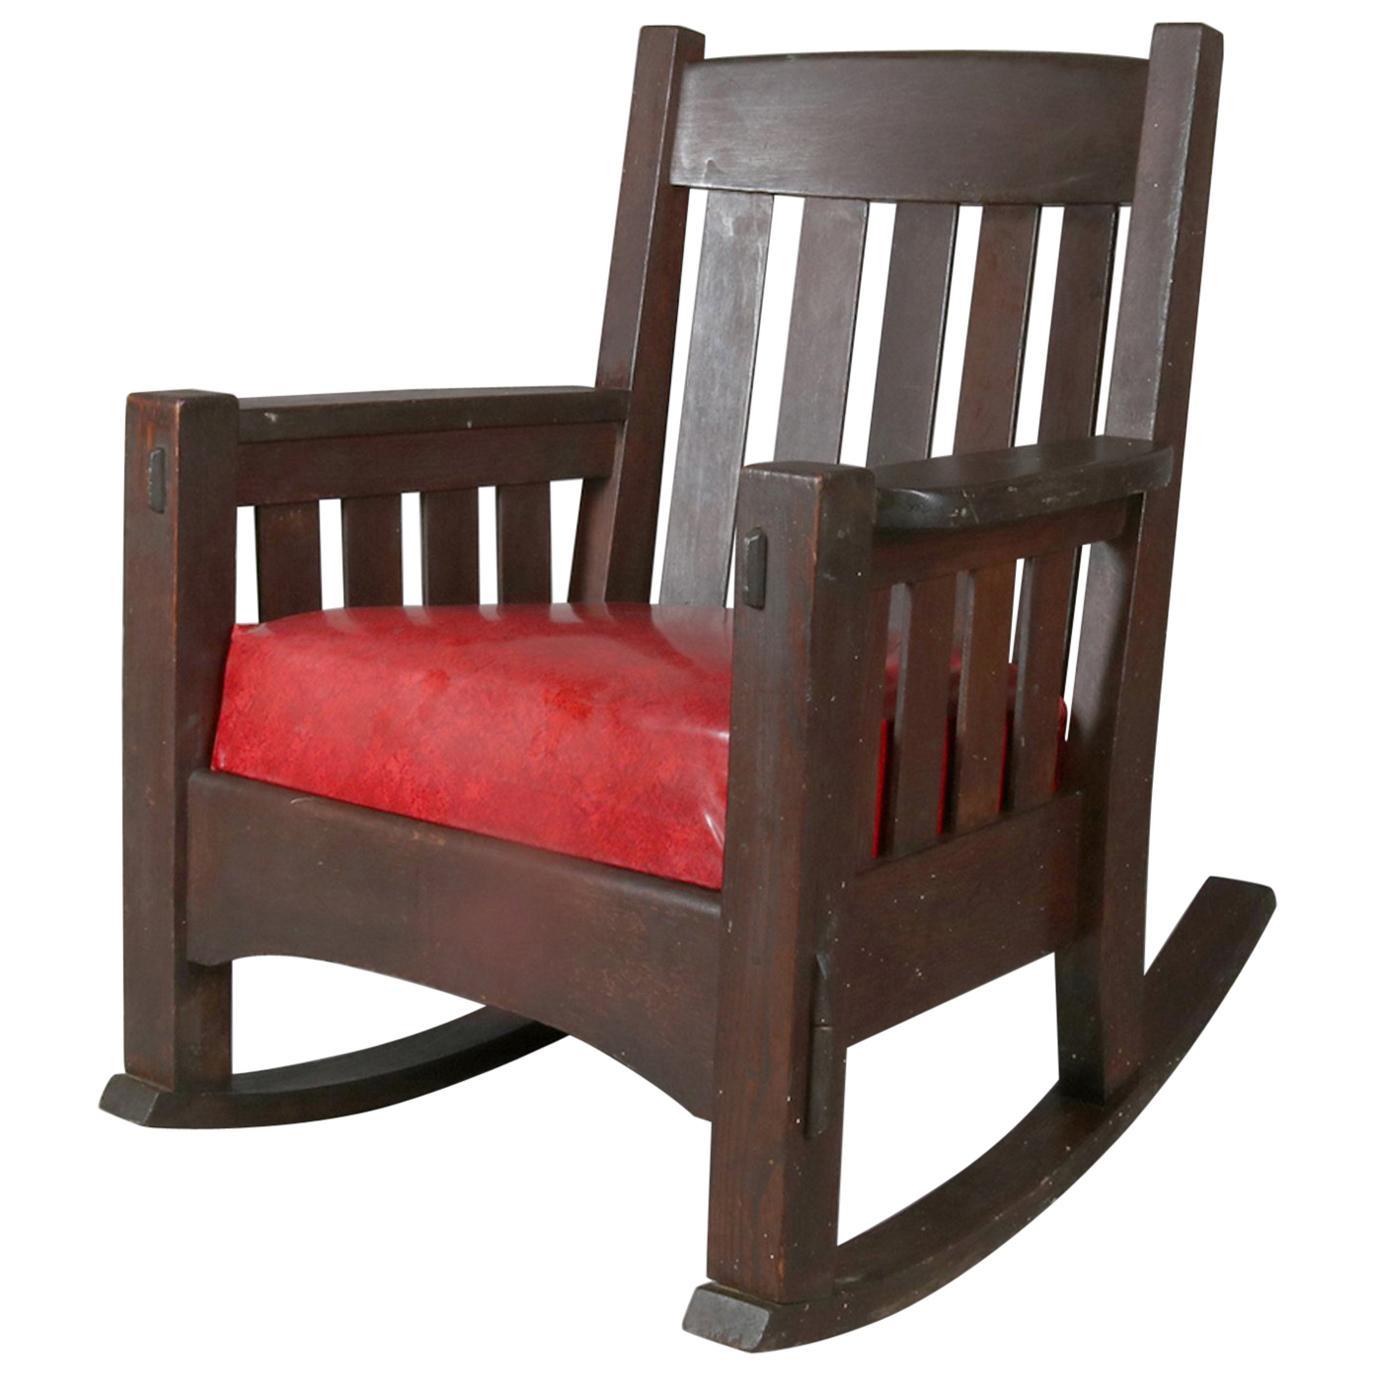 Merveilleux Arts U0026 Crafts Gustav Stickley School Mission Oak Rocking Chair By Harden  For Sale